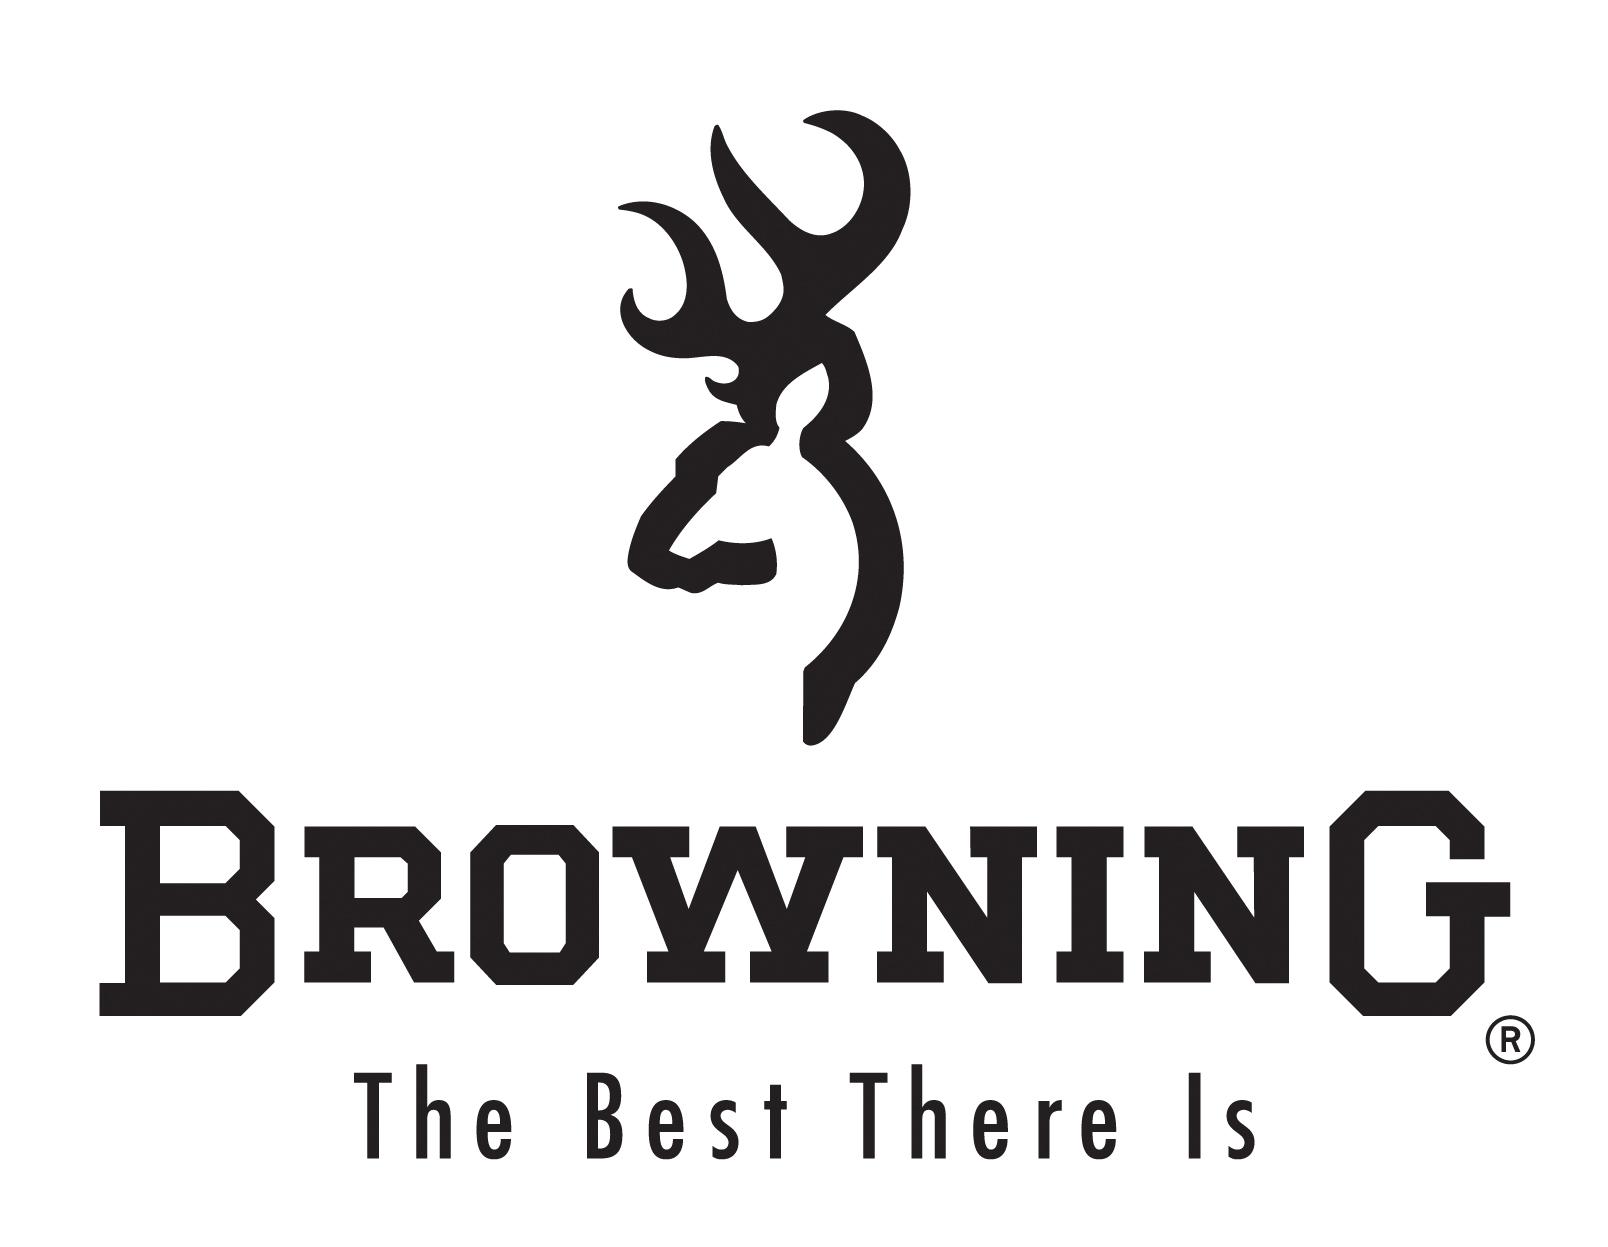 Browning Buckmark Wallpaper